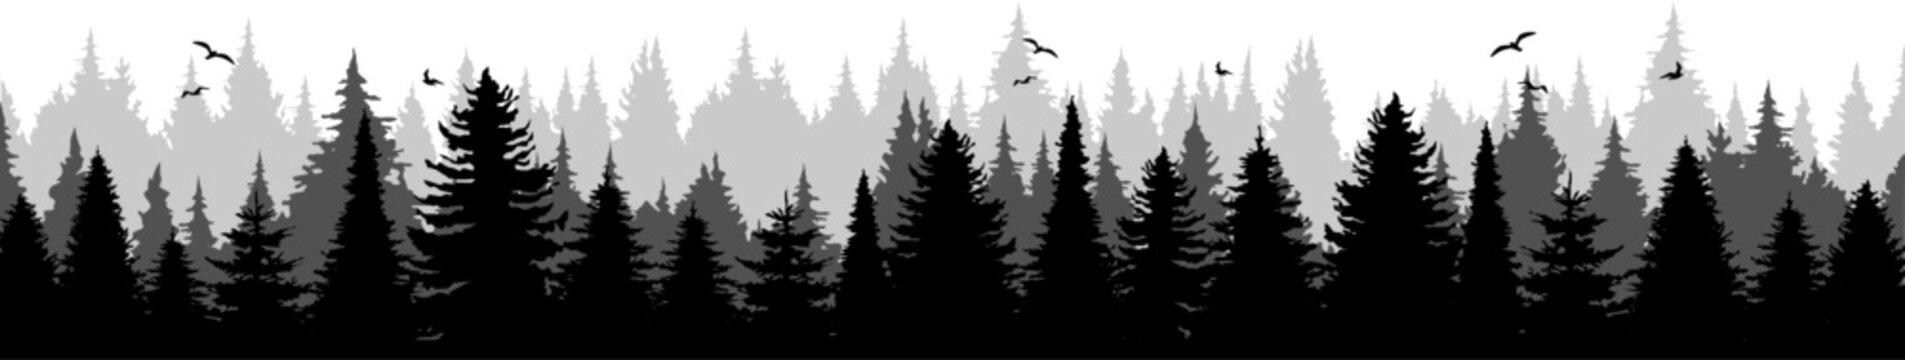 Conifer Tree Forest Landscape Vector Silhouette